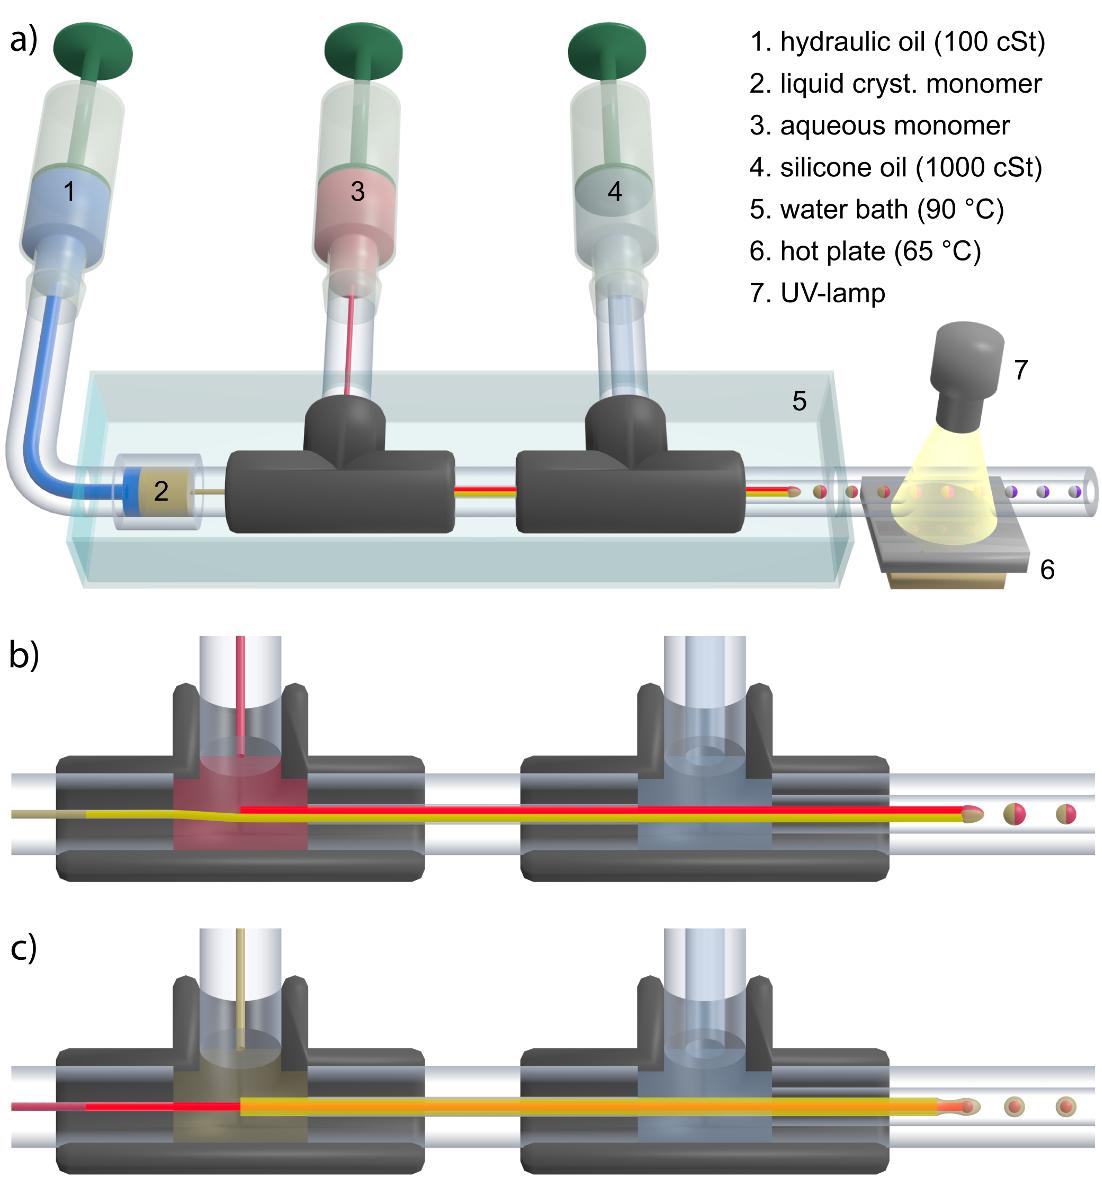 Microfluidic Preparation of Liquid Crystalline Elastomer Actuators